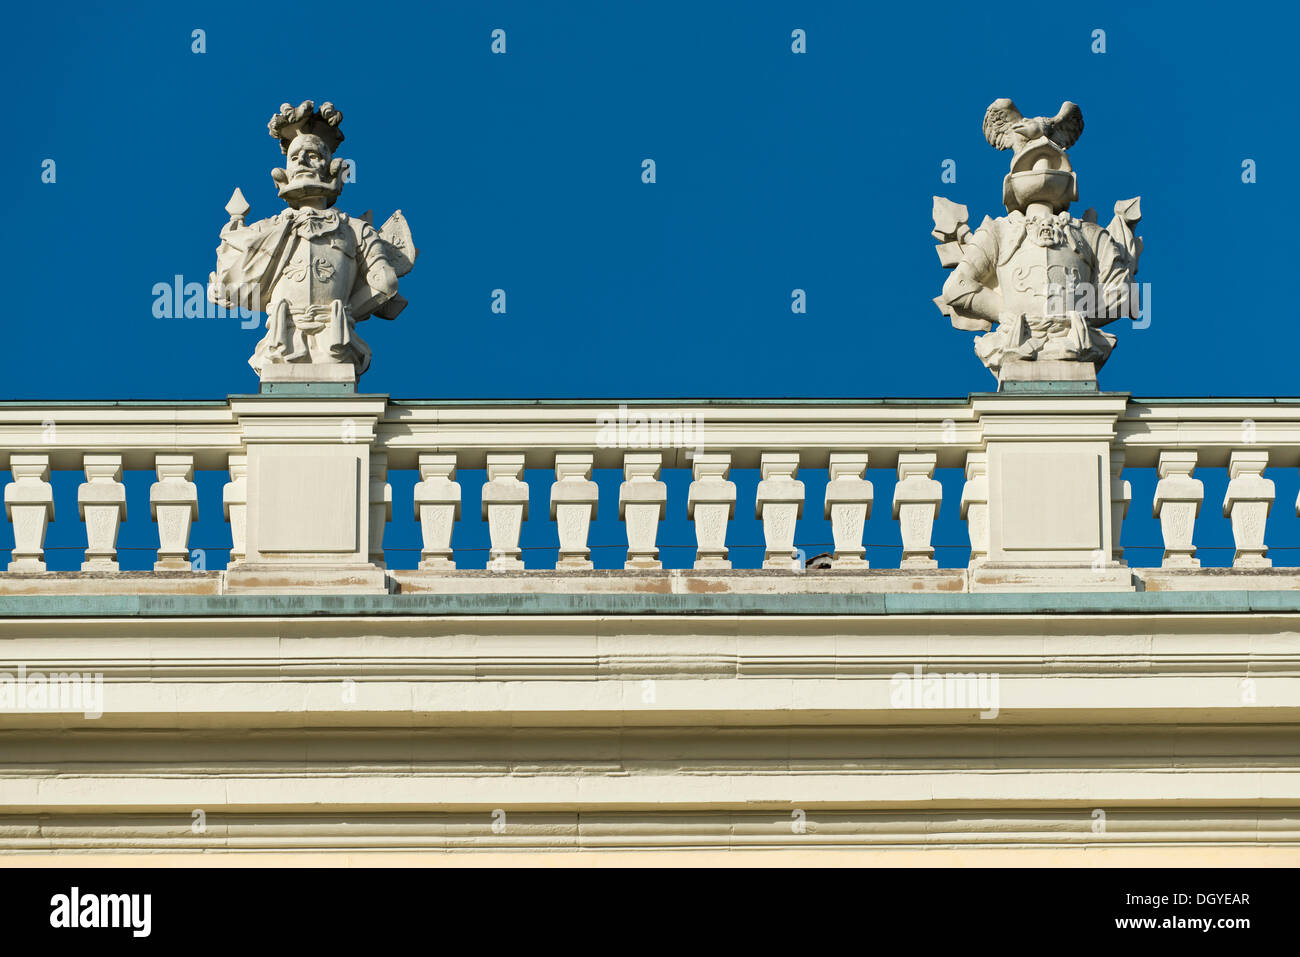 Büsten, Skulpturen, Geländer, Schloss Schloss Ludwigsburg, Baden-Württemberg Stockbild